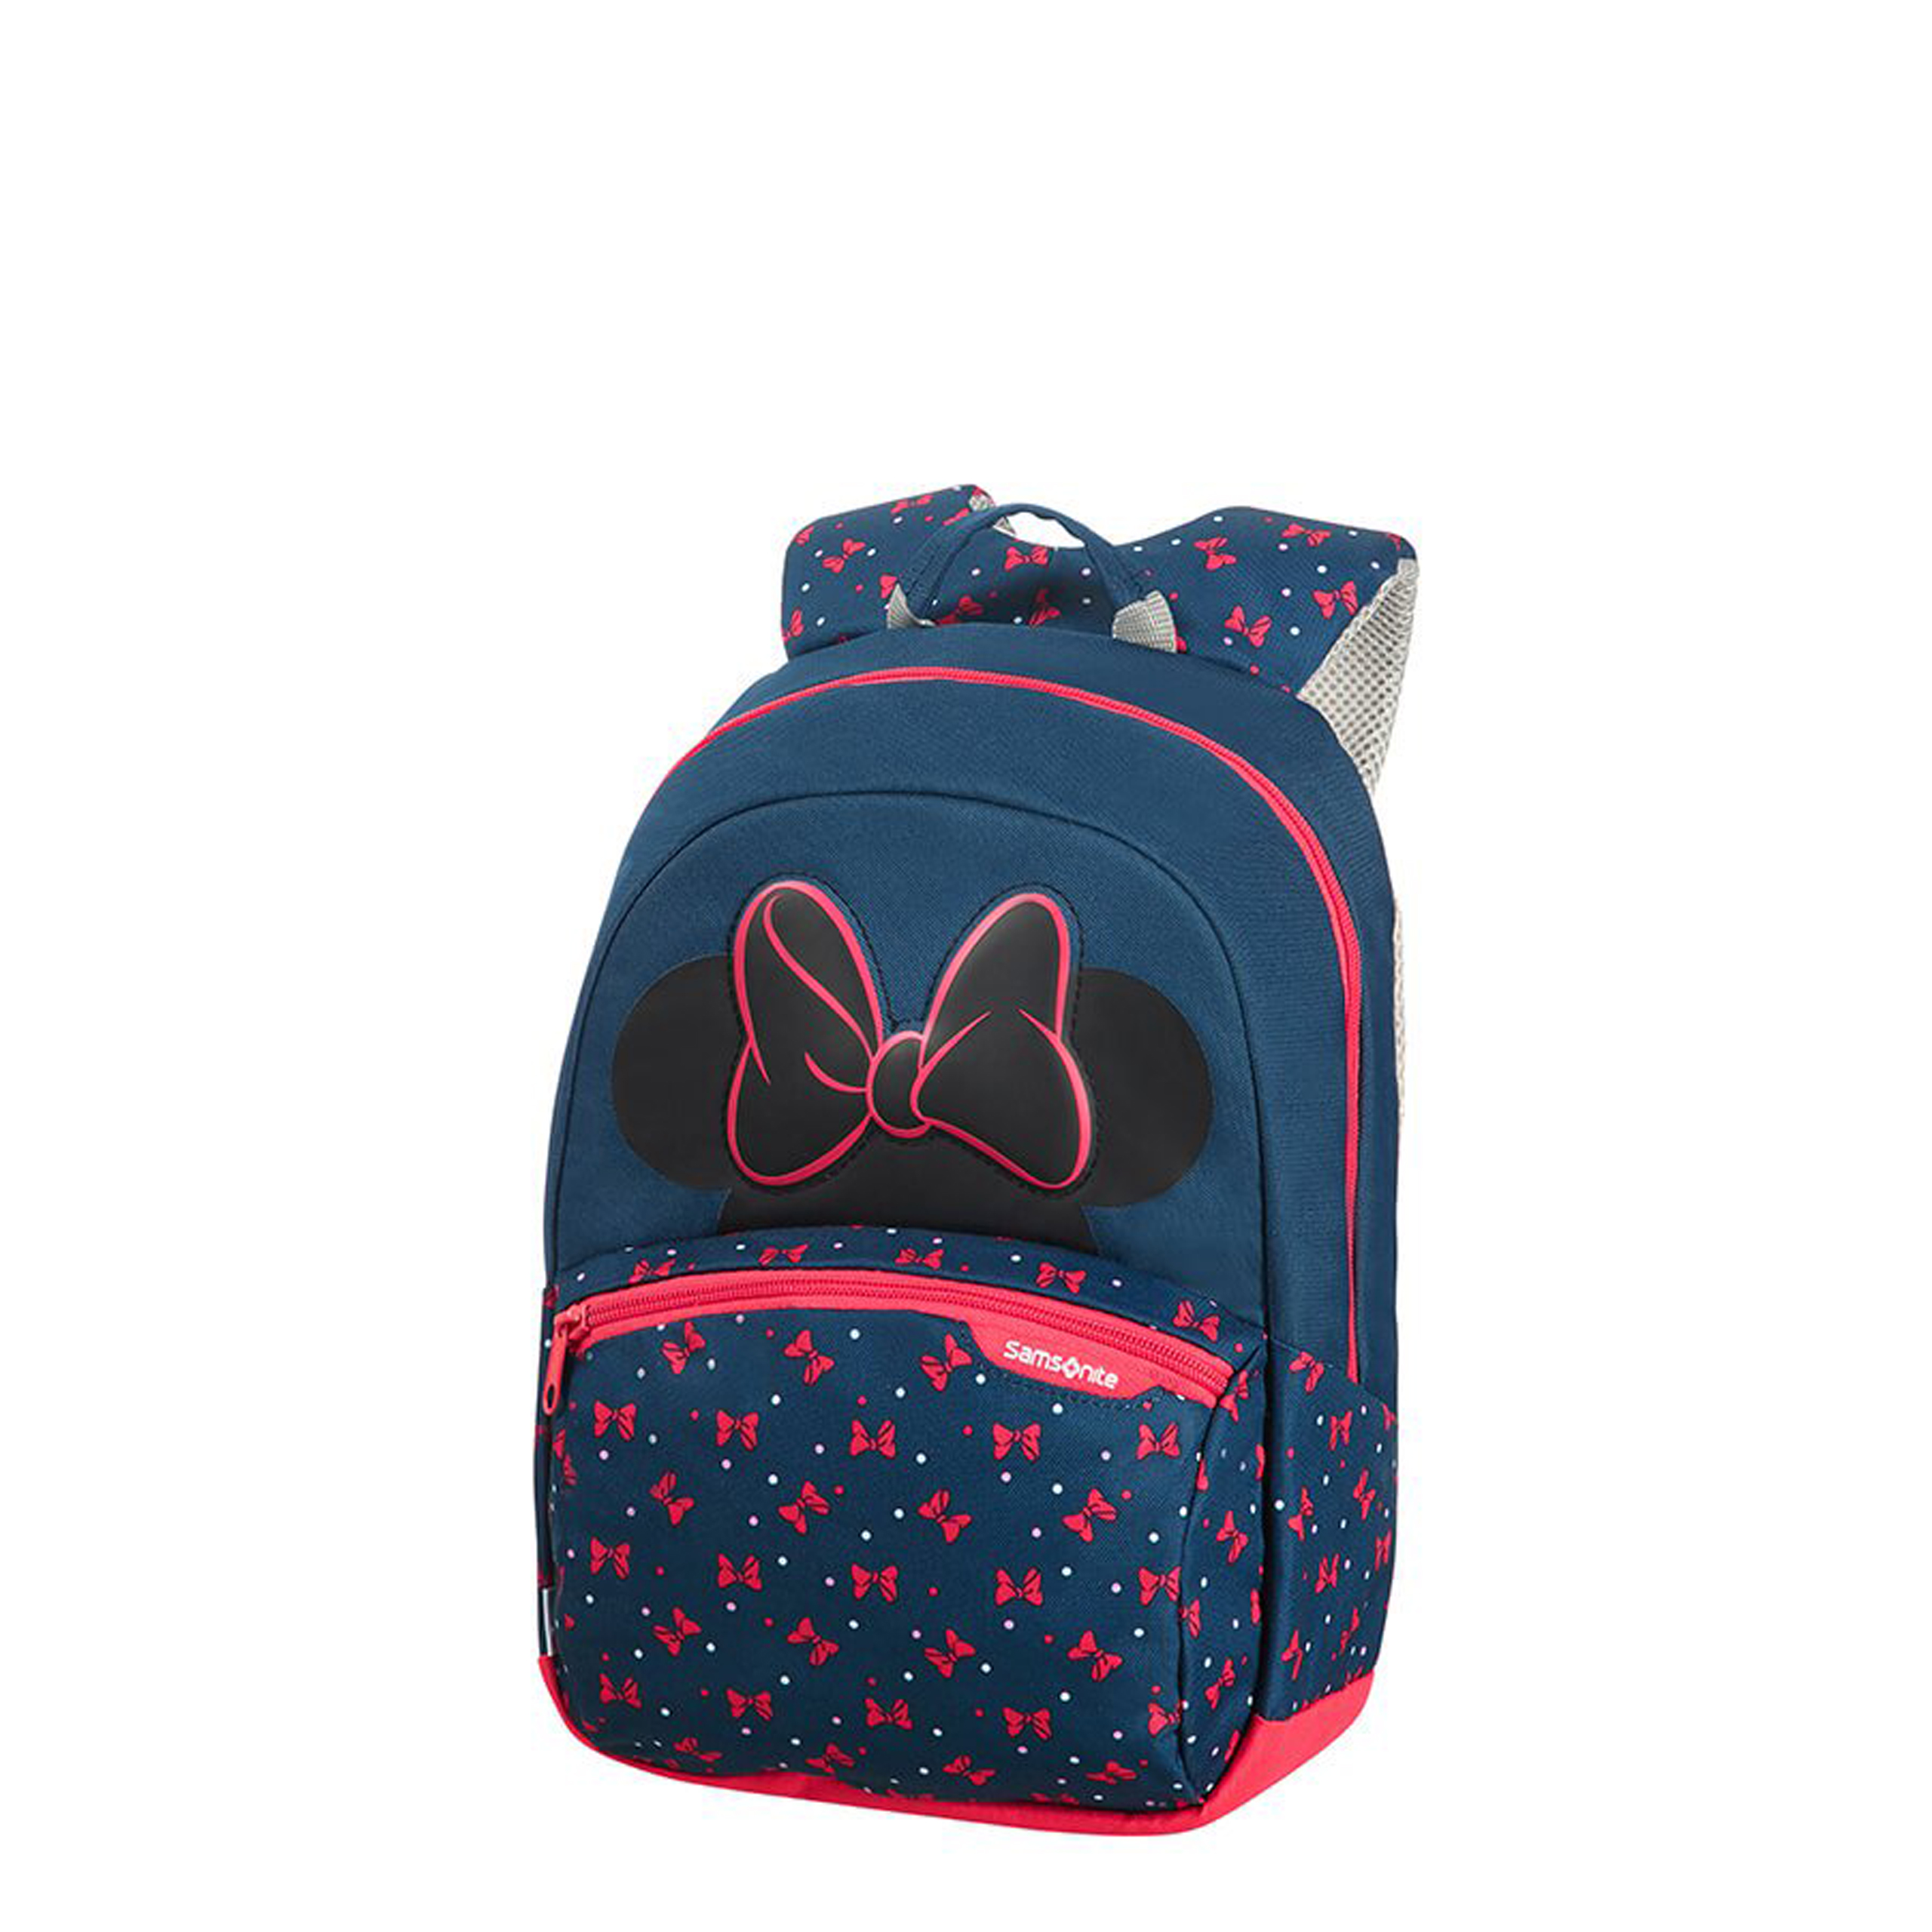 f46992ccfaaf1 New Line - Plecak Samsonite Disney Minnie Neon 40C 01 008 - Twoja ...